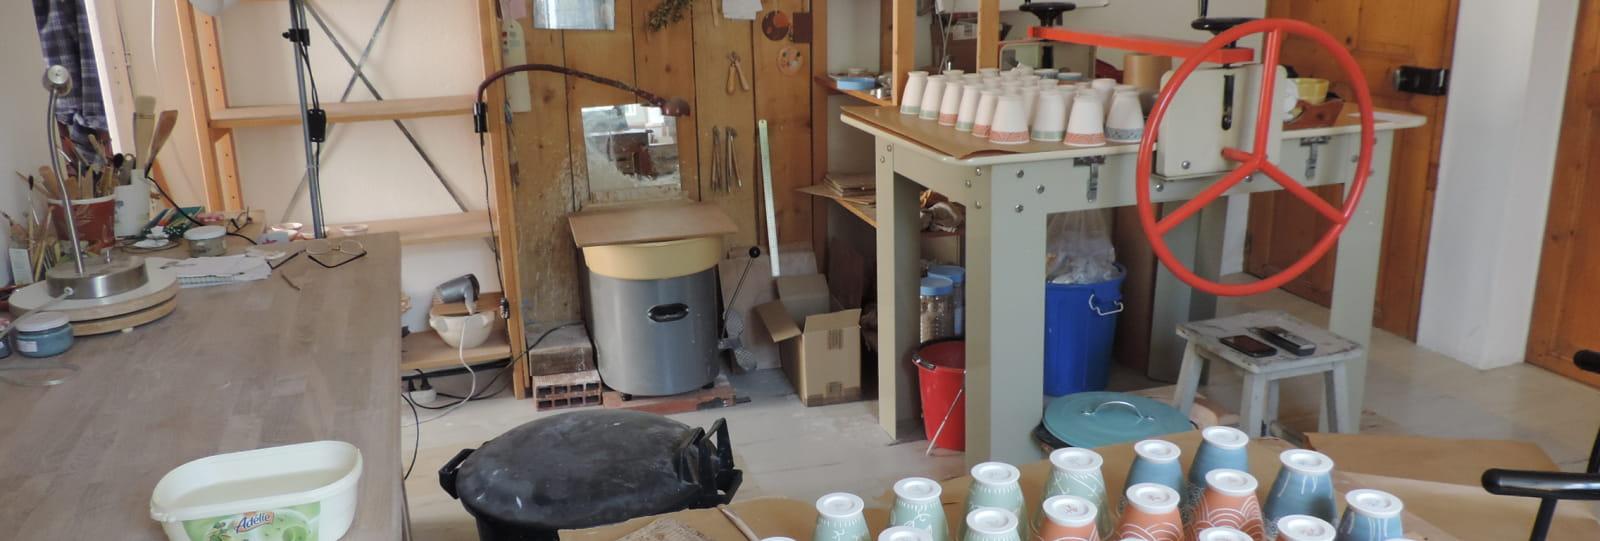 Atelier de poterie - ANNULE